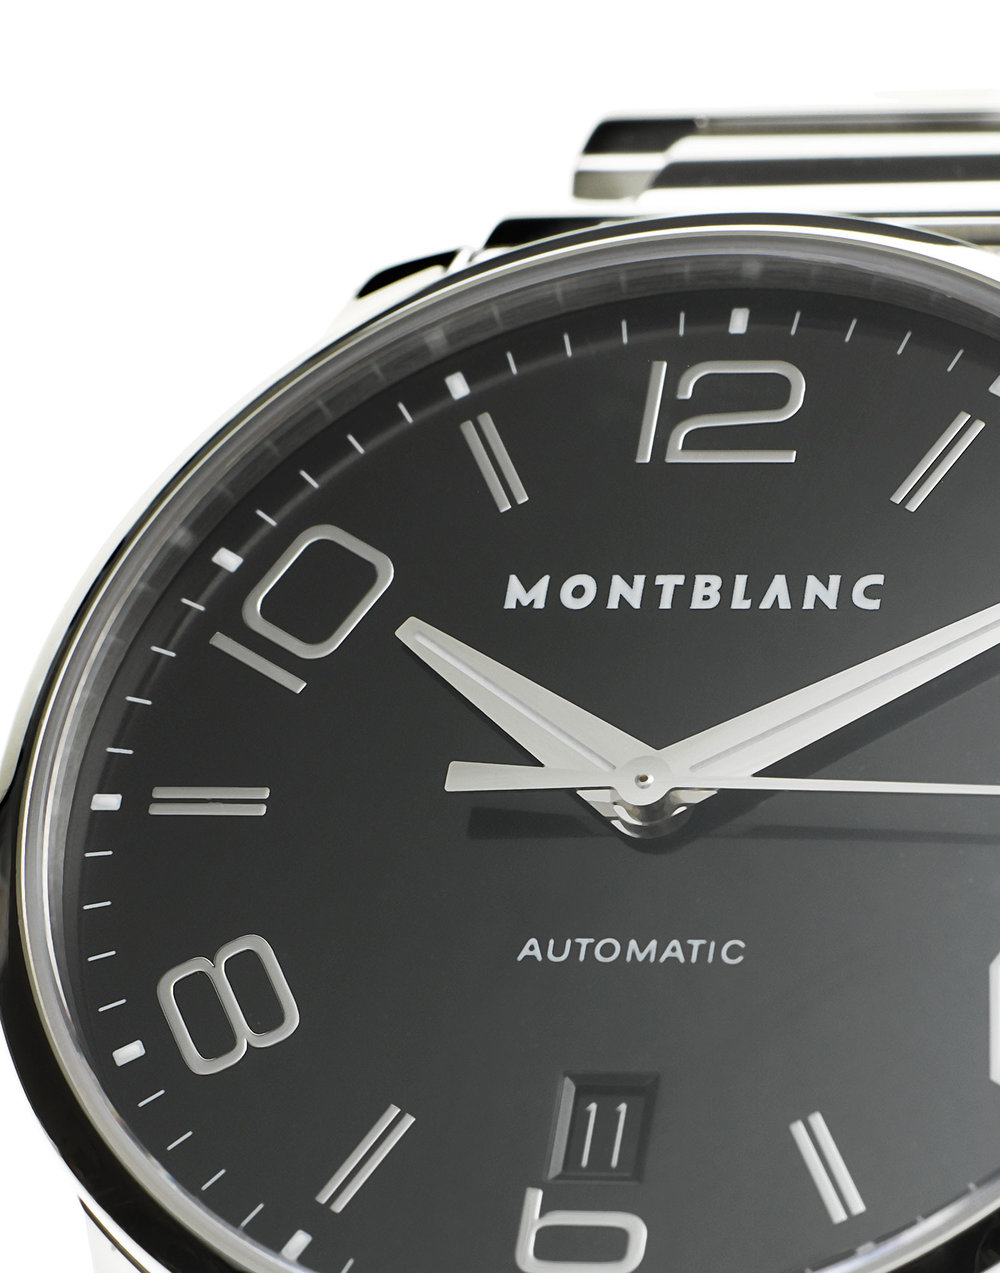 MontBlanc_005-1571x2000.jpg